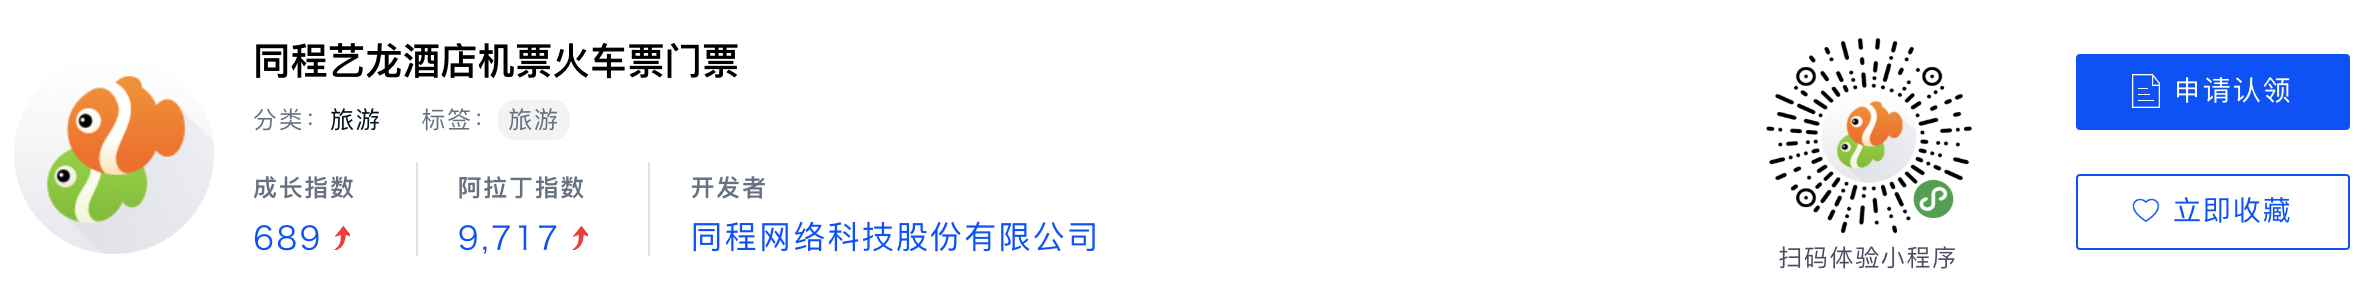 WeChatミニプログラム最新ランキングTOP20【2019年6月版】4位:同城艺龙酒店机票火车票门票